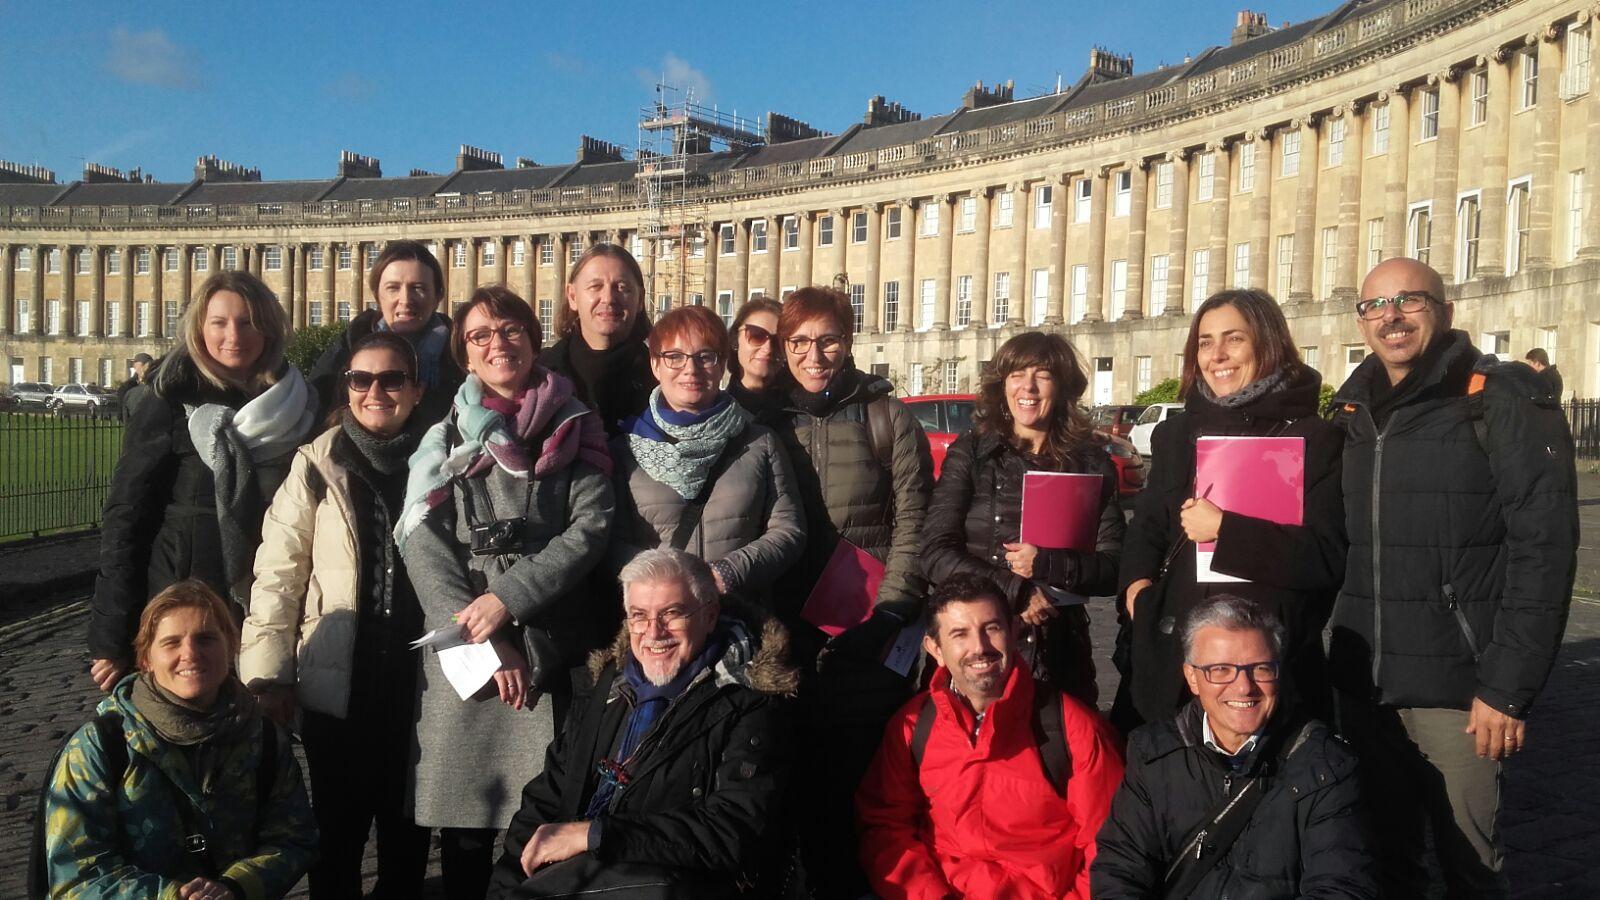 In Bath learning new ICT with European teachers. @LaPurisimaValen @EUErasmusPlus https://t.co/B0pd2xfIry